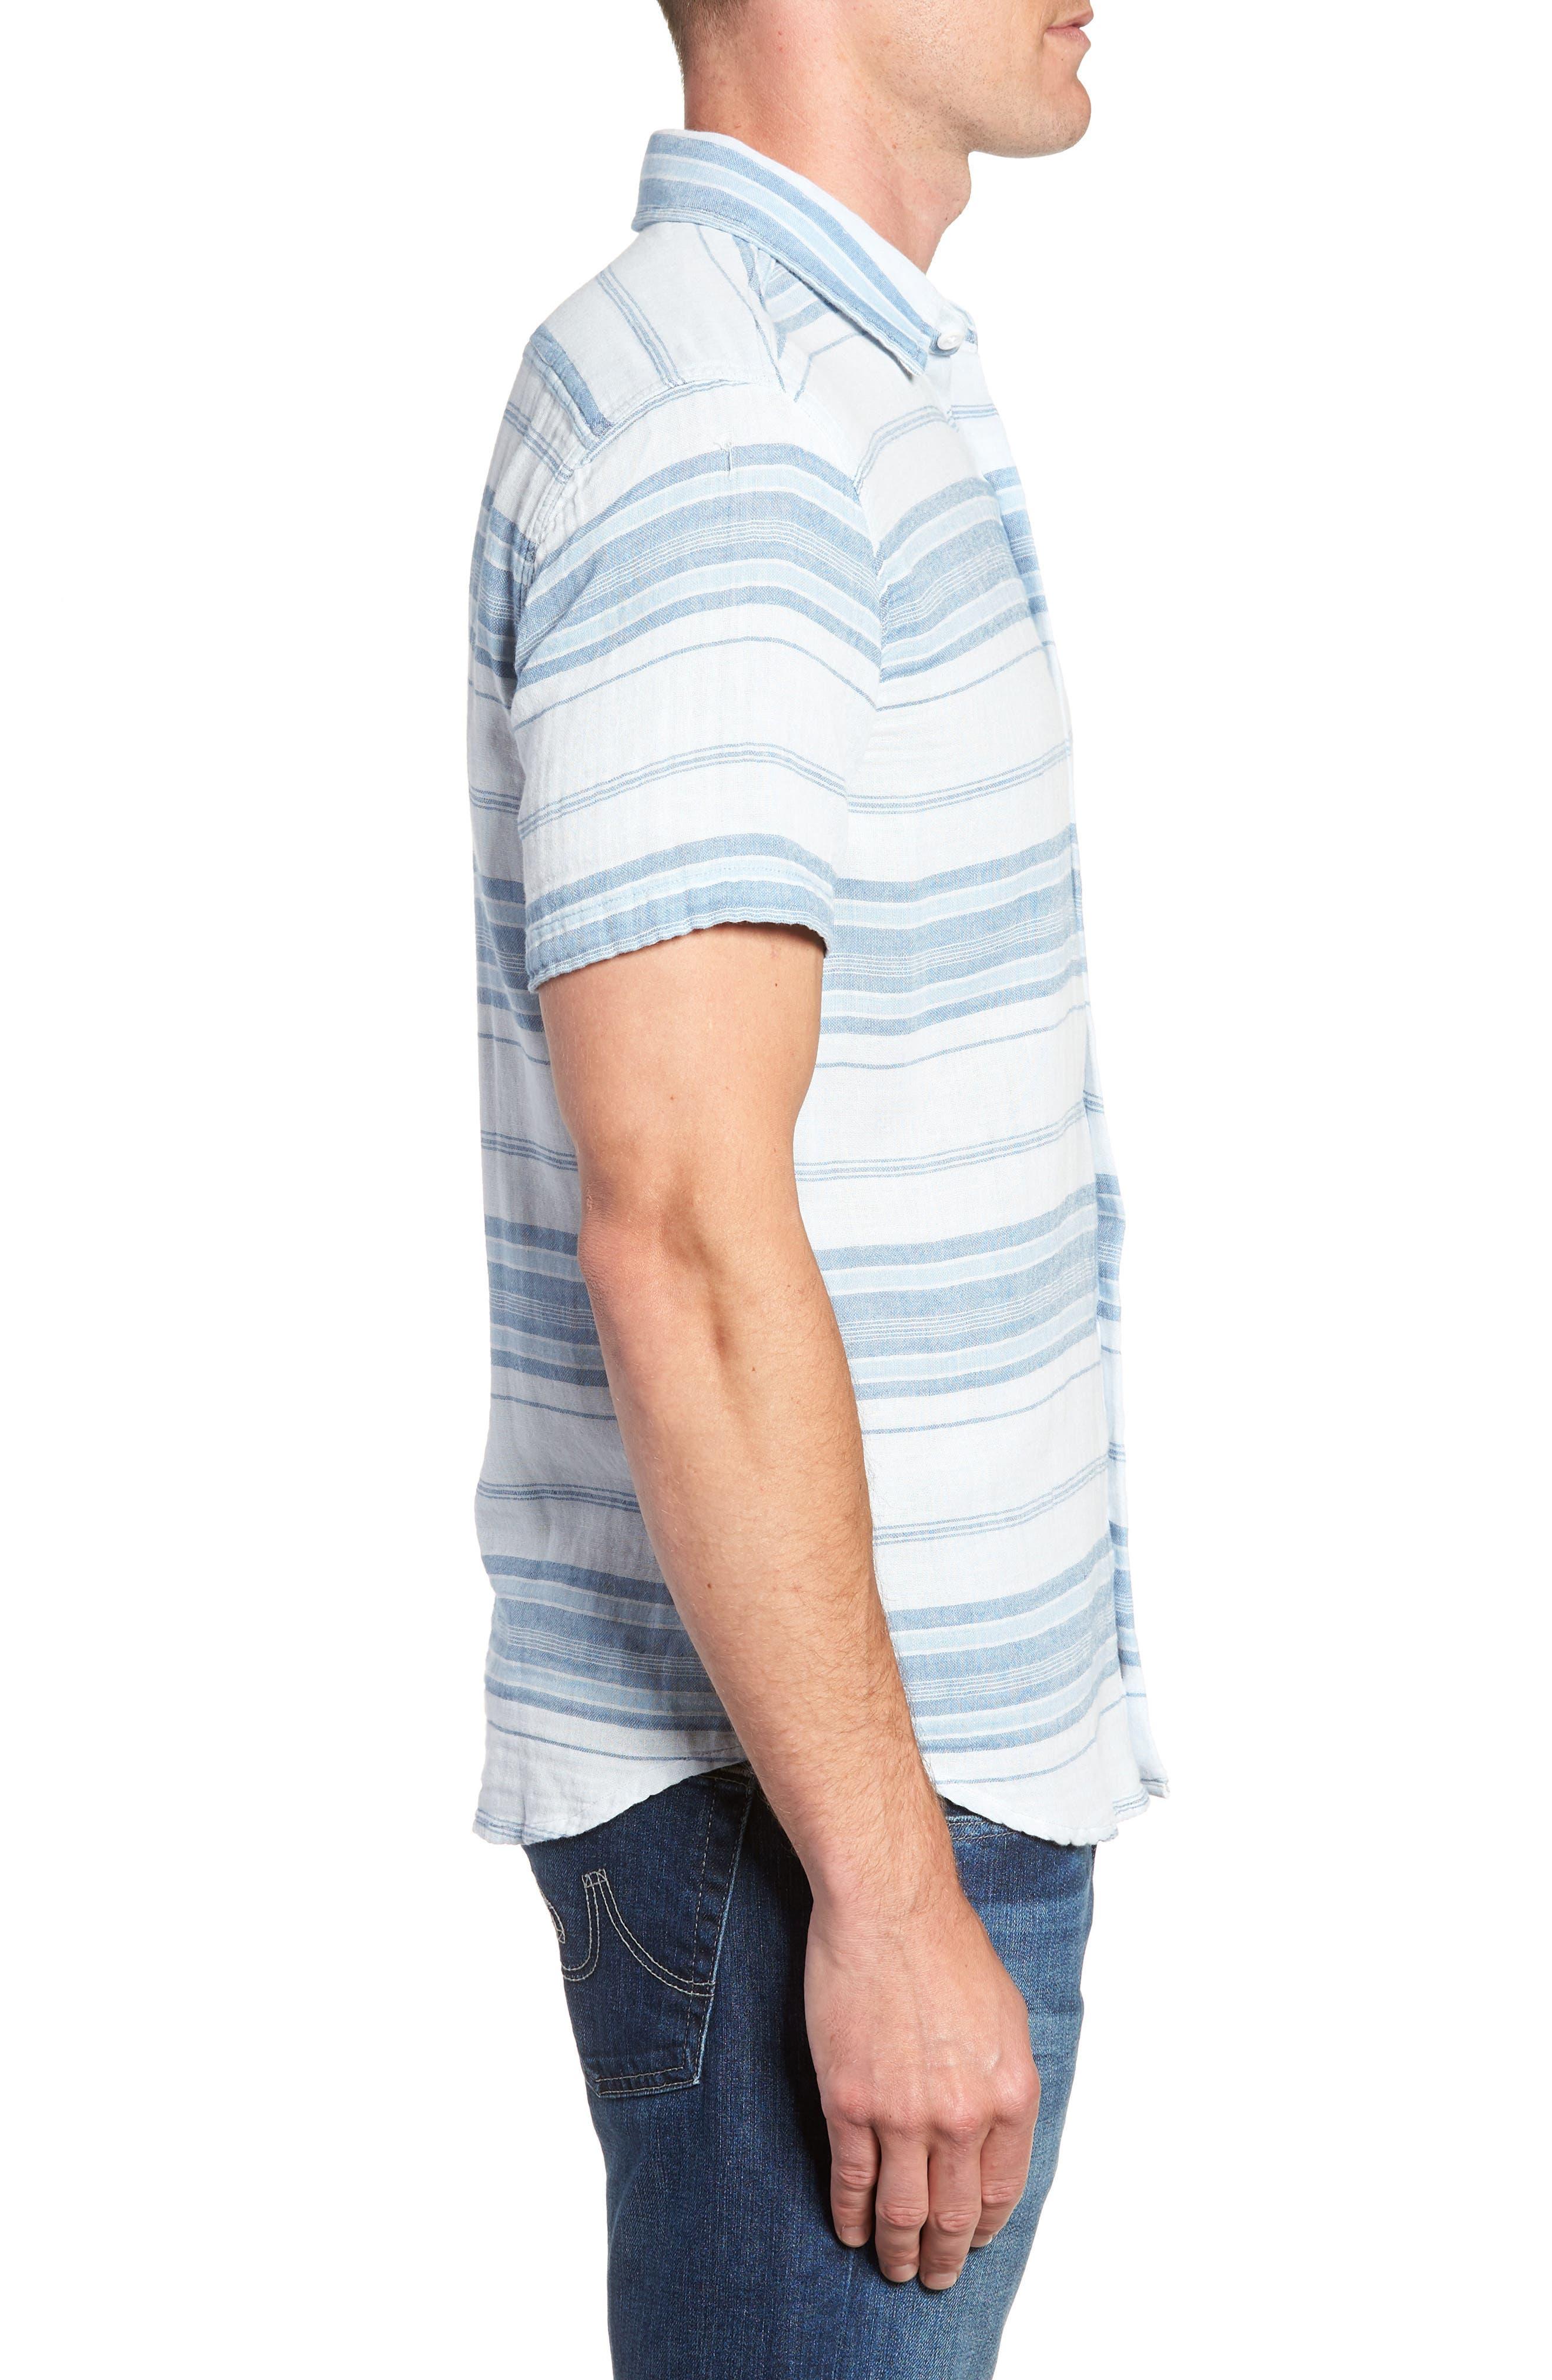 Ventura Double Cloth Short Sleeve Shirt,                             Alternate thumbnail 5, color,                             Light Indigo Serape